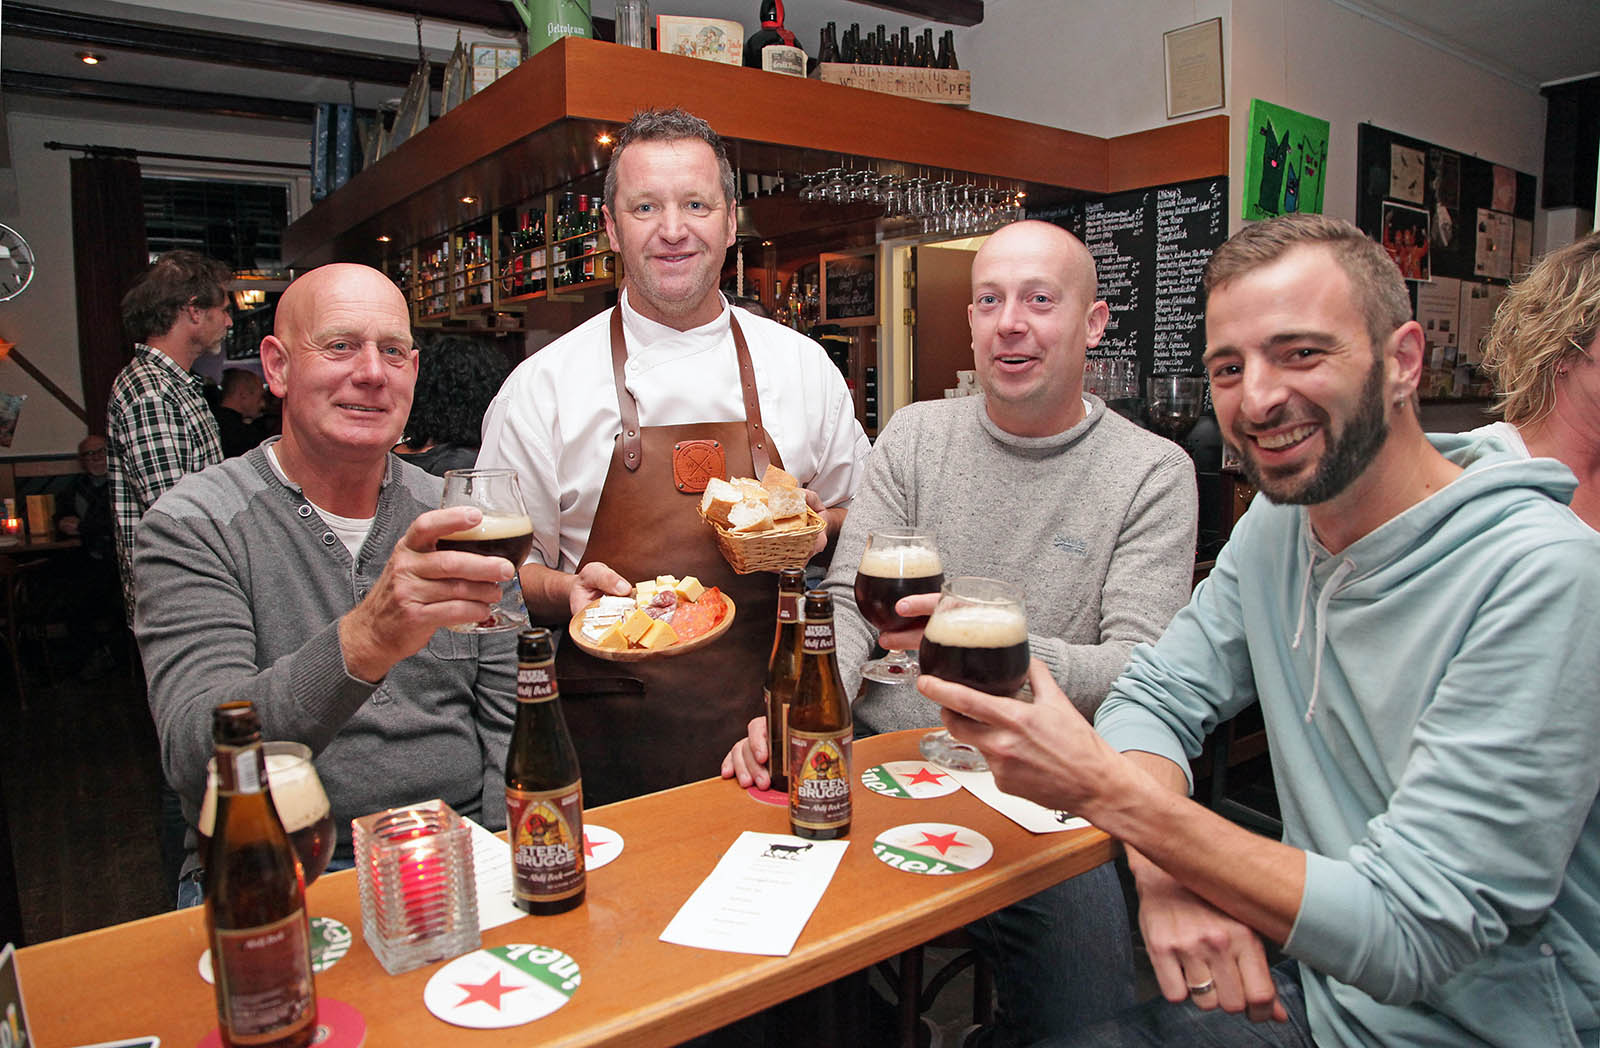 Café De Meester